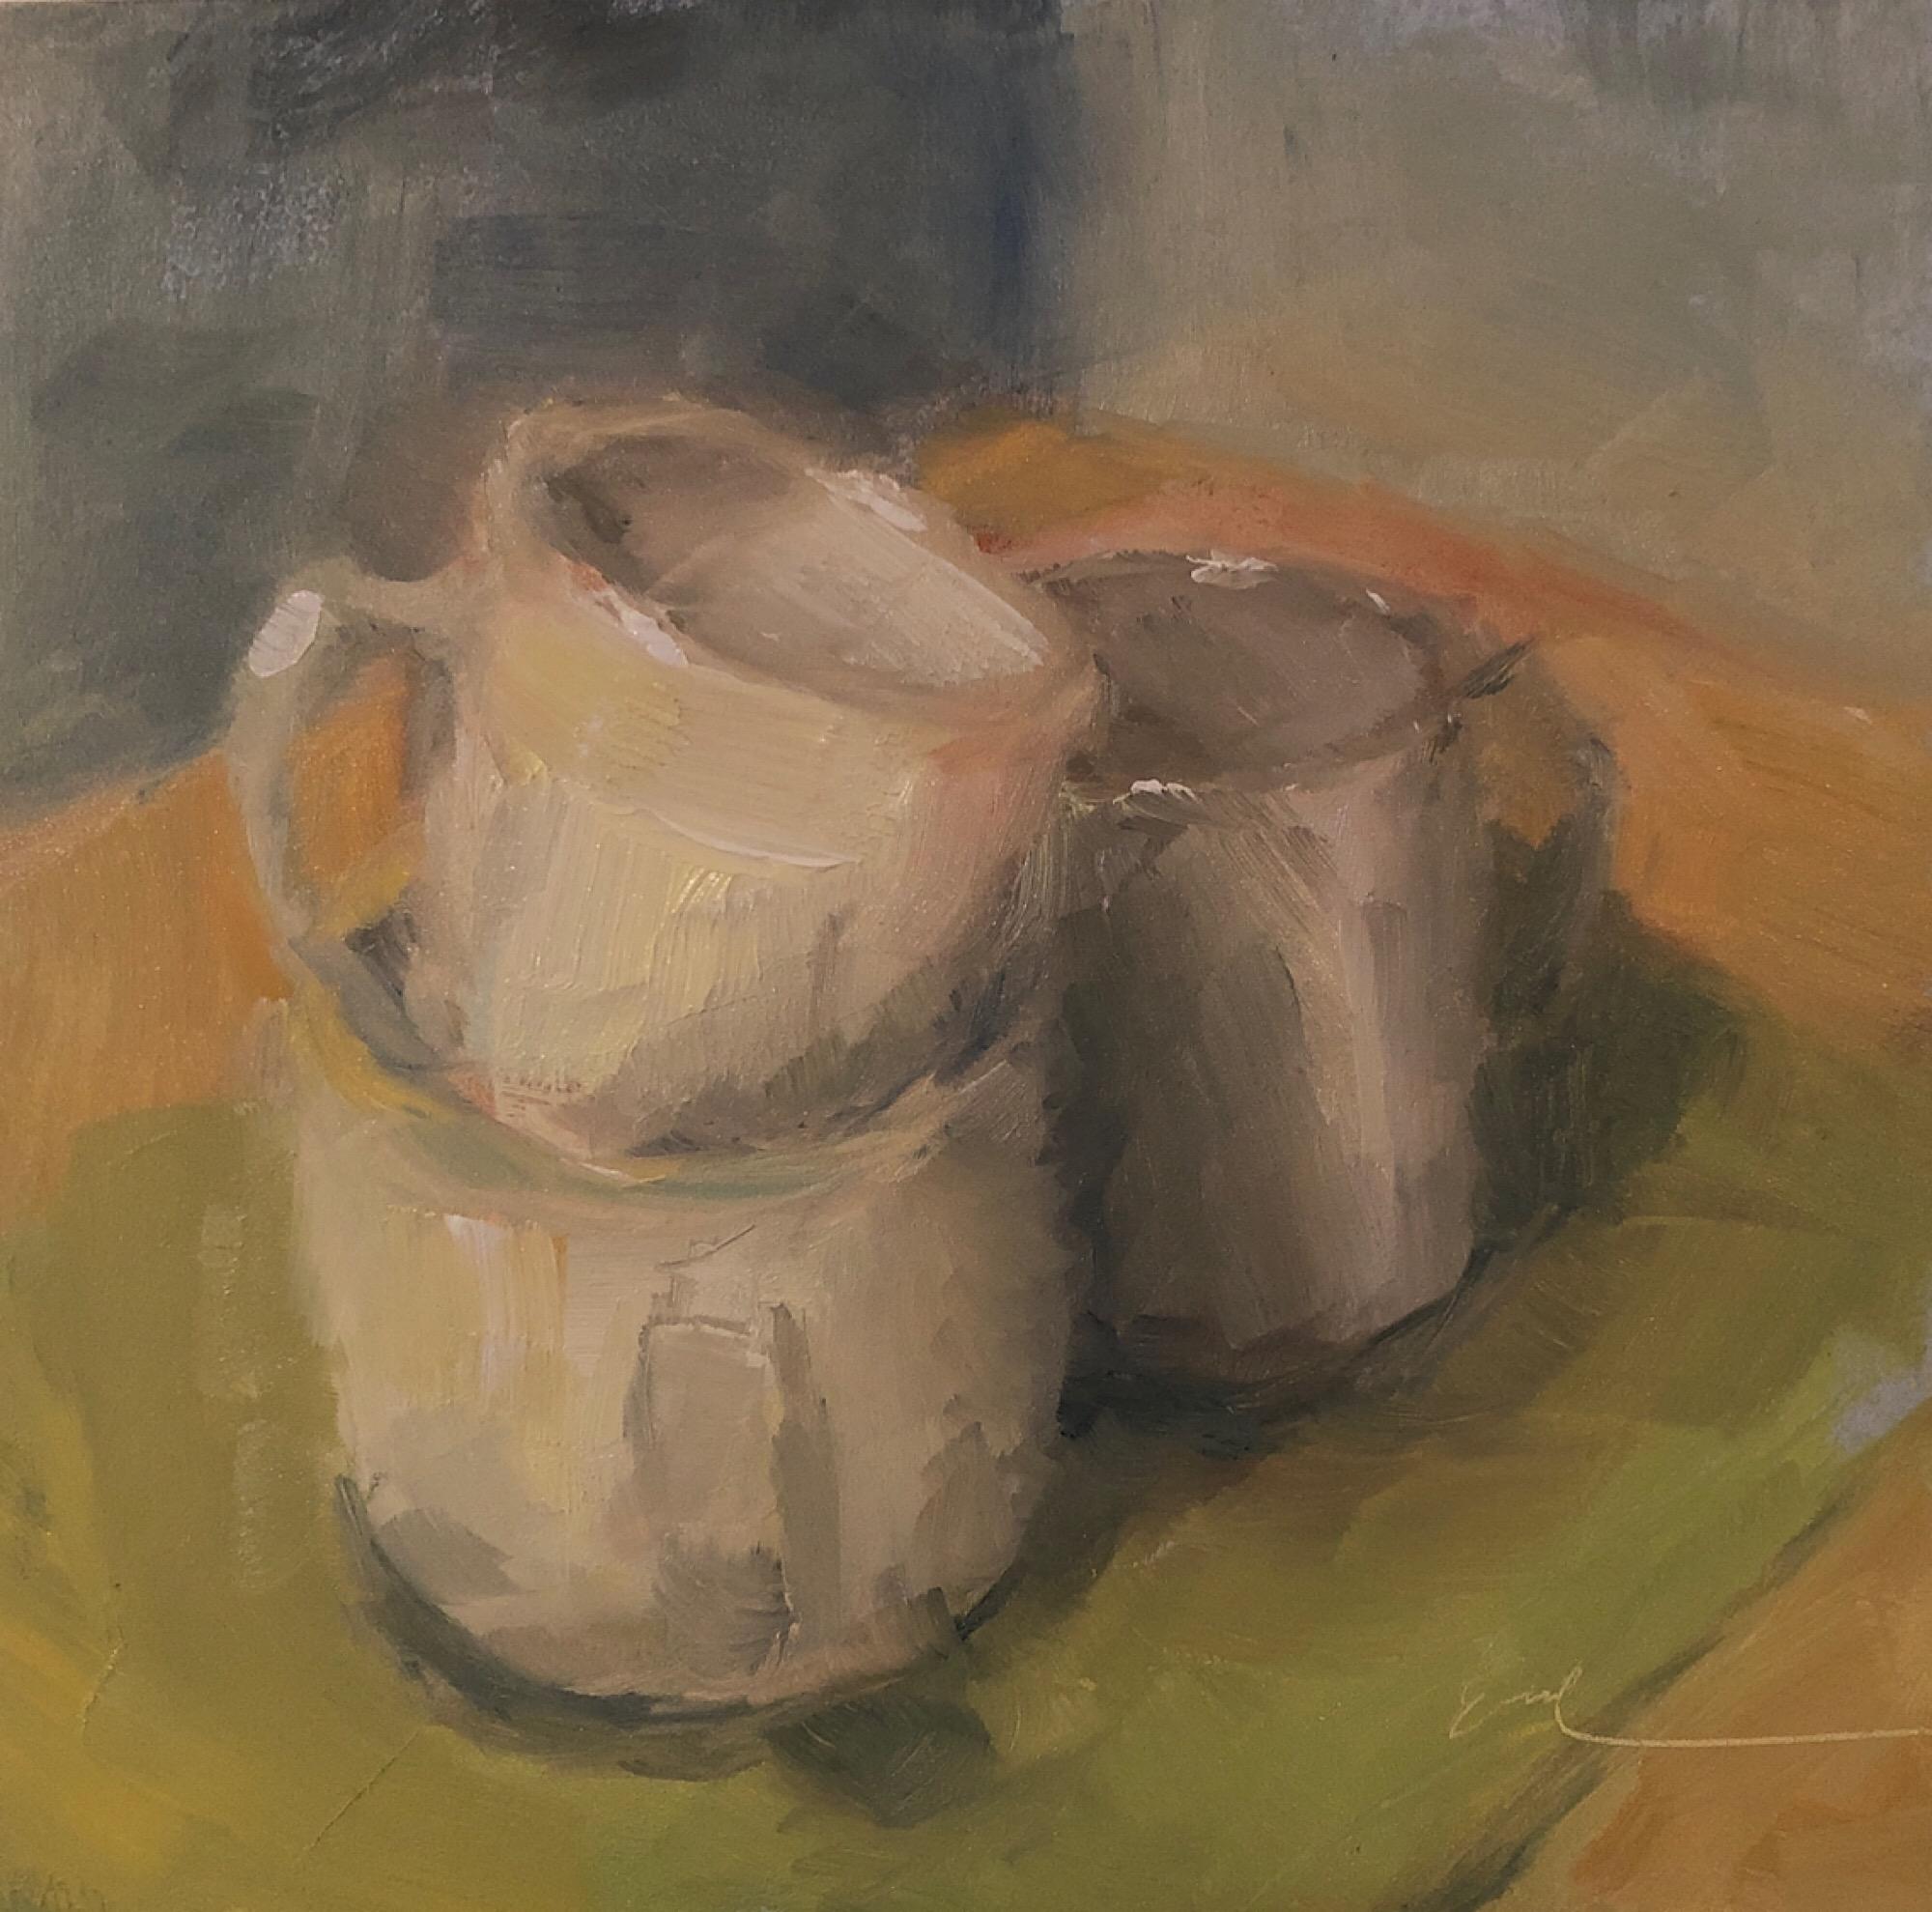 "Geoff Watson, ""Mugs (study),"" June daily painting #25, oil on panel, 6"" x 6,"" 2019."